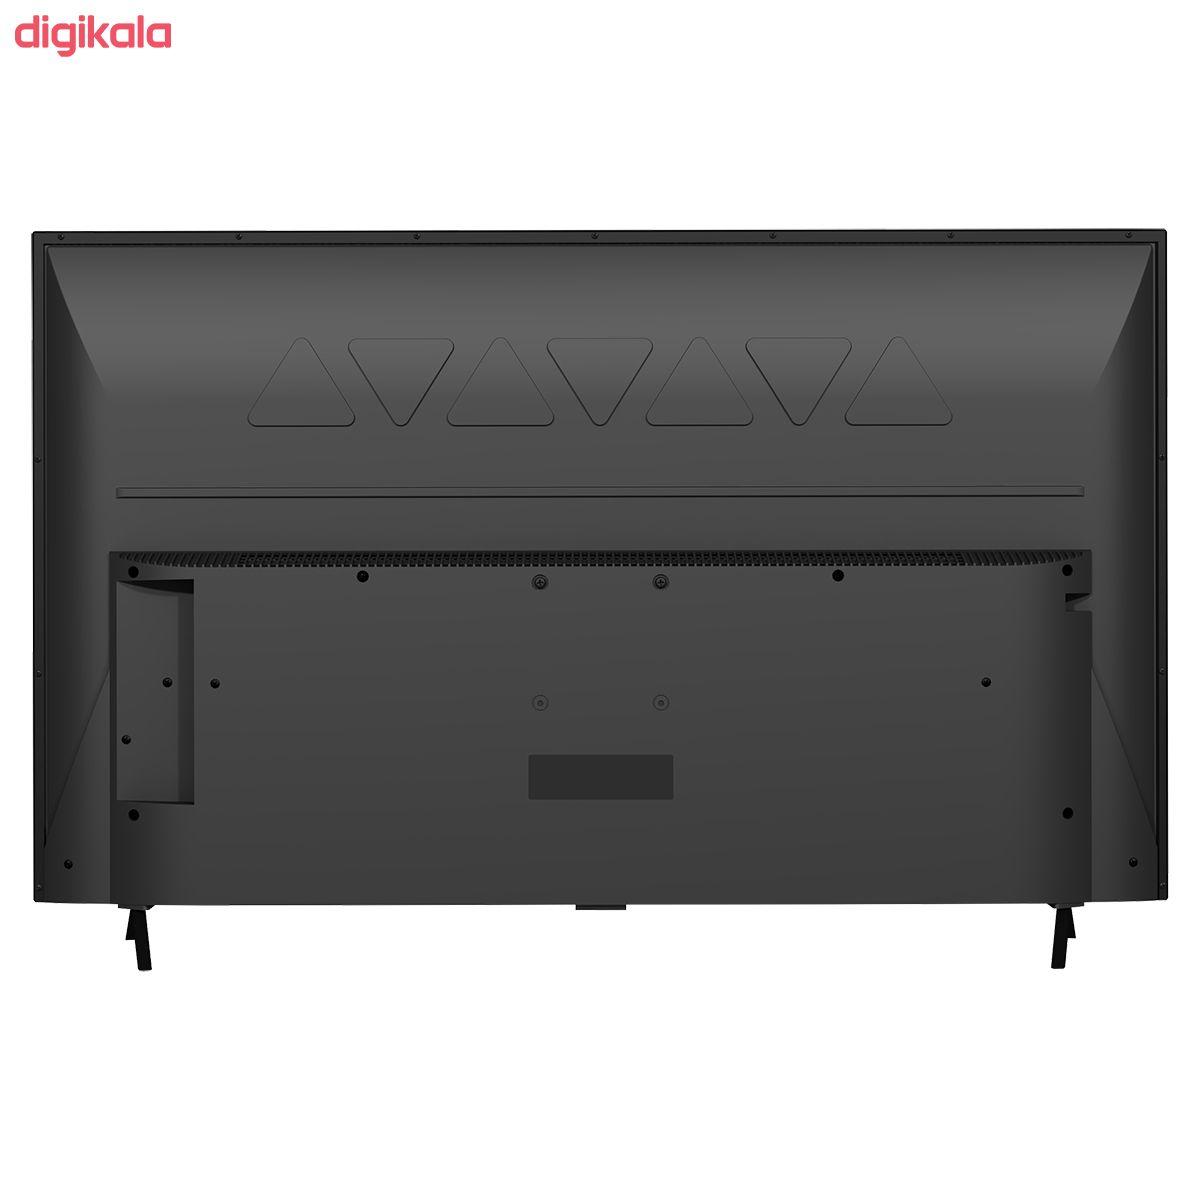 تلویزیون ال ای دی هوشمند تی سی ال مدل 43S6510 سایز 43 اینچ main 1 4